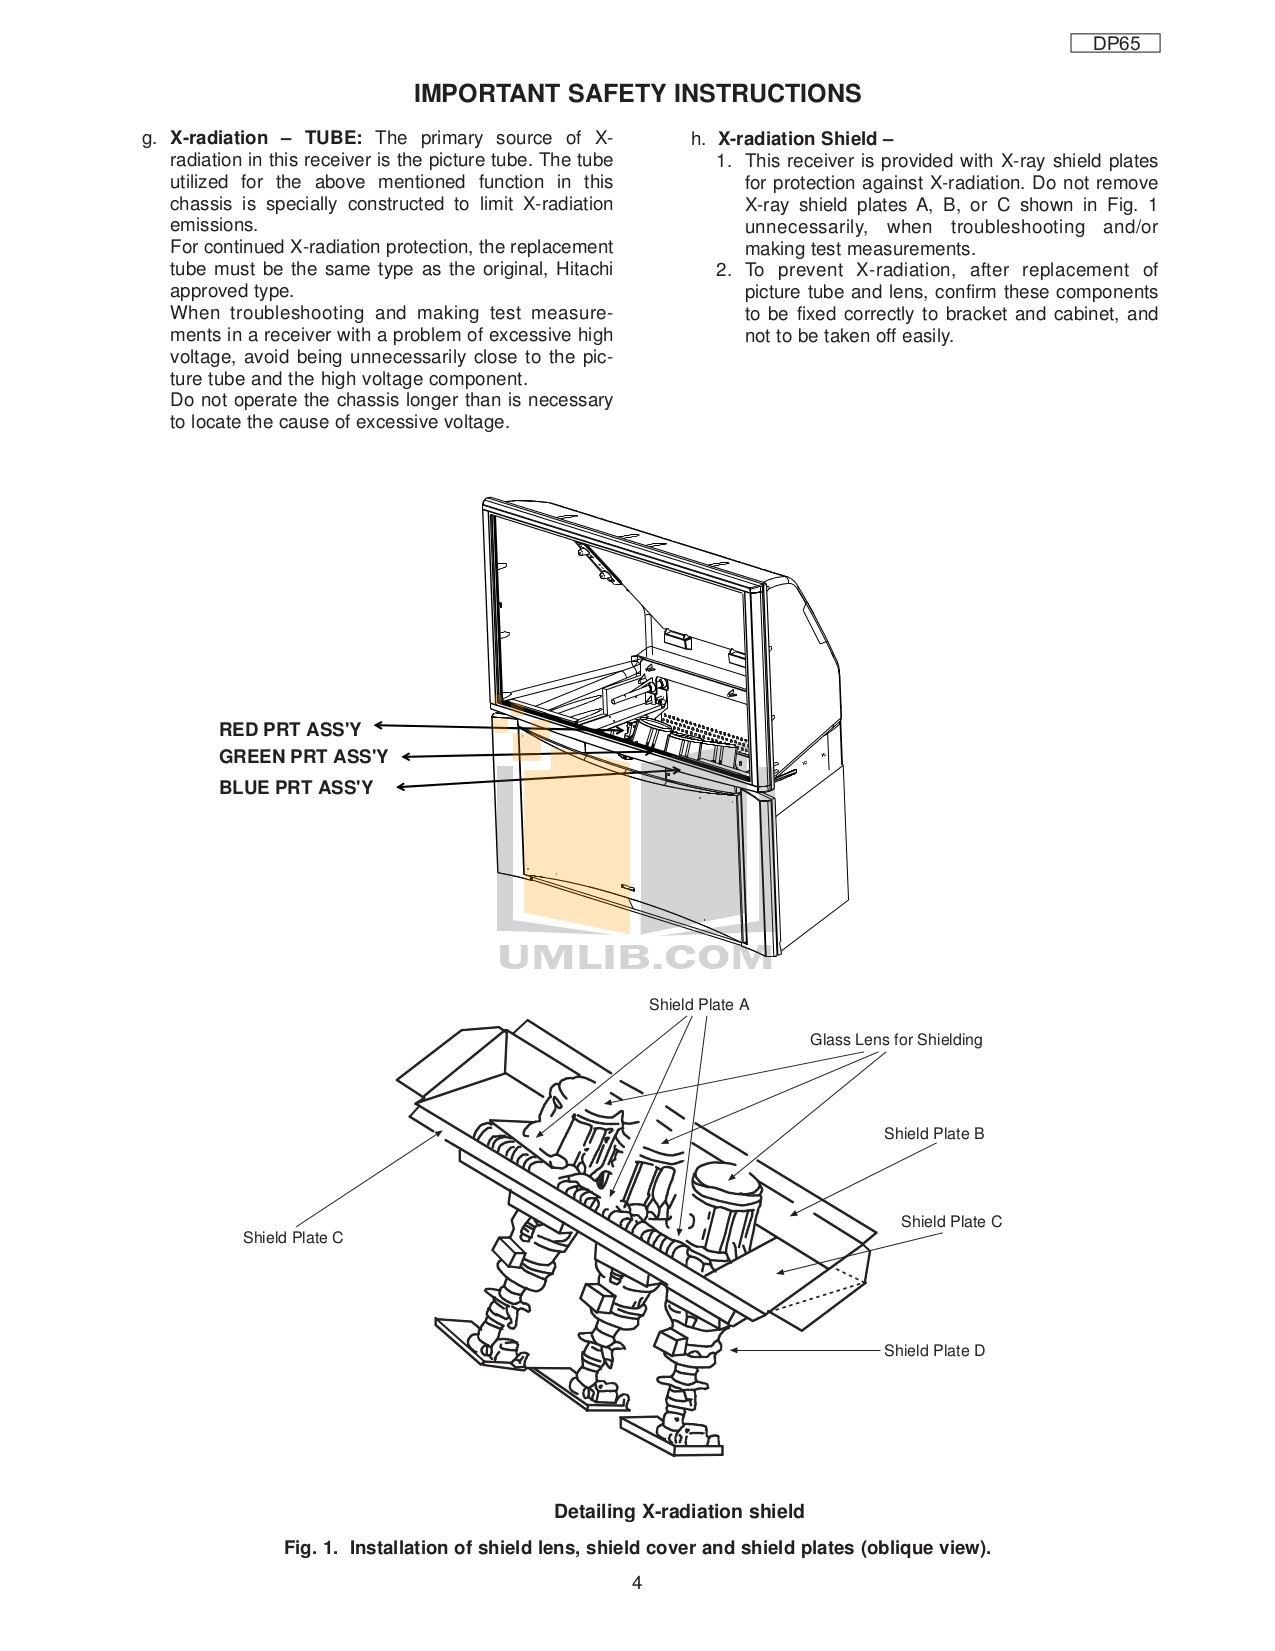 Hitachi 51f59a 51f59 service manual: hitachi: amazon. Com: books.